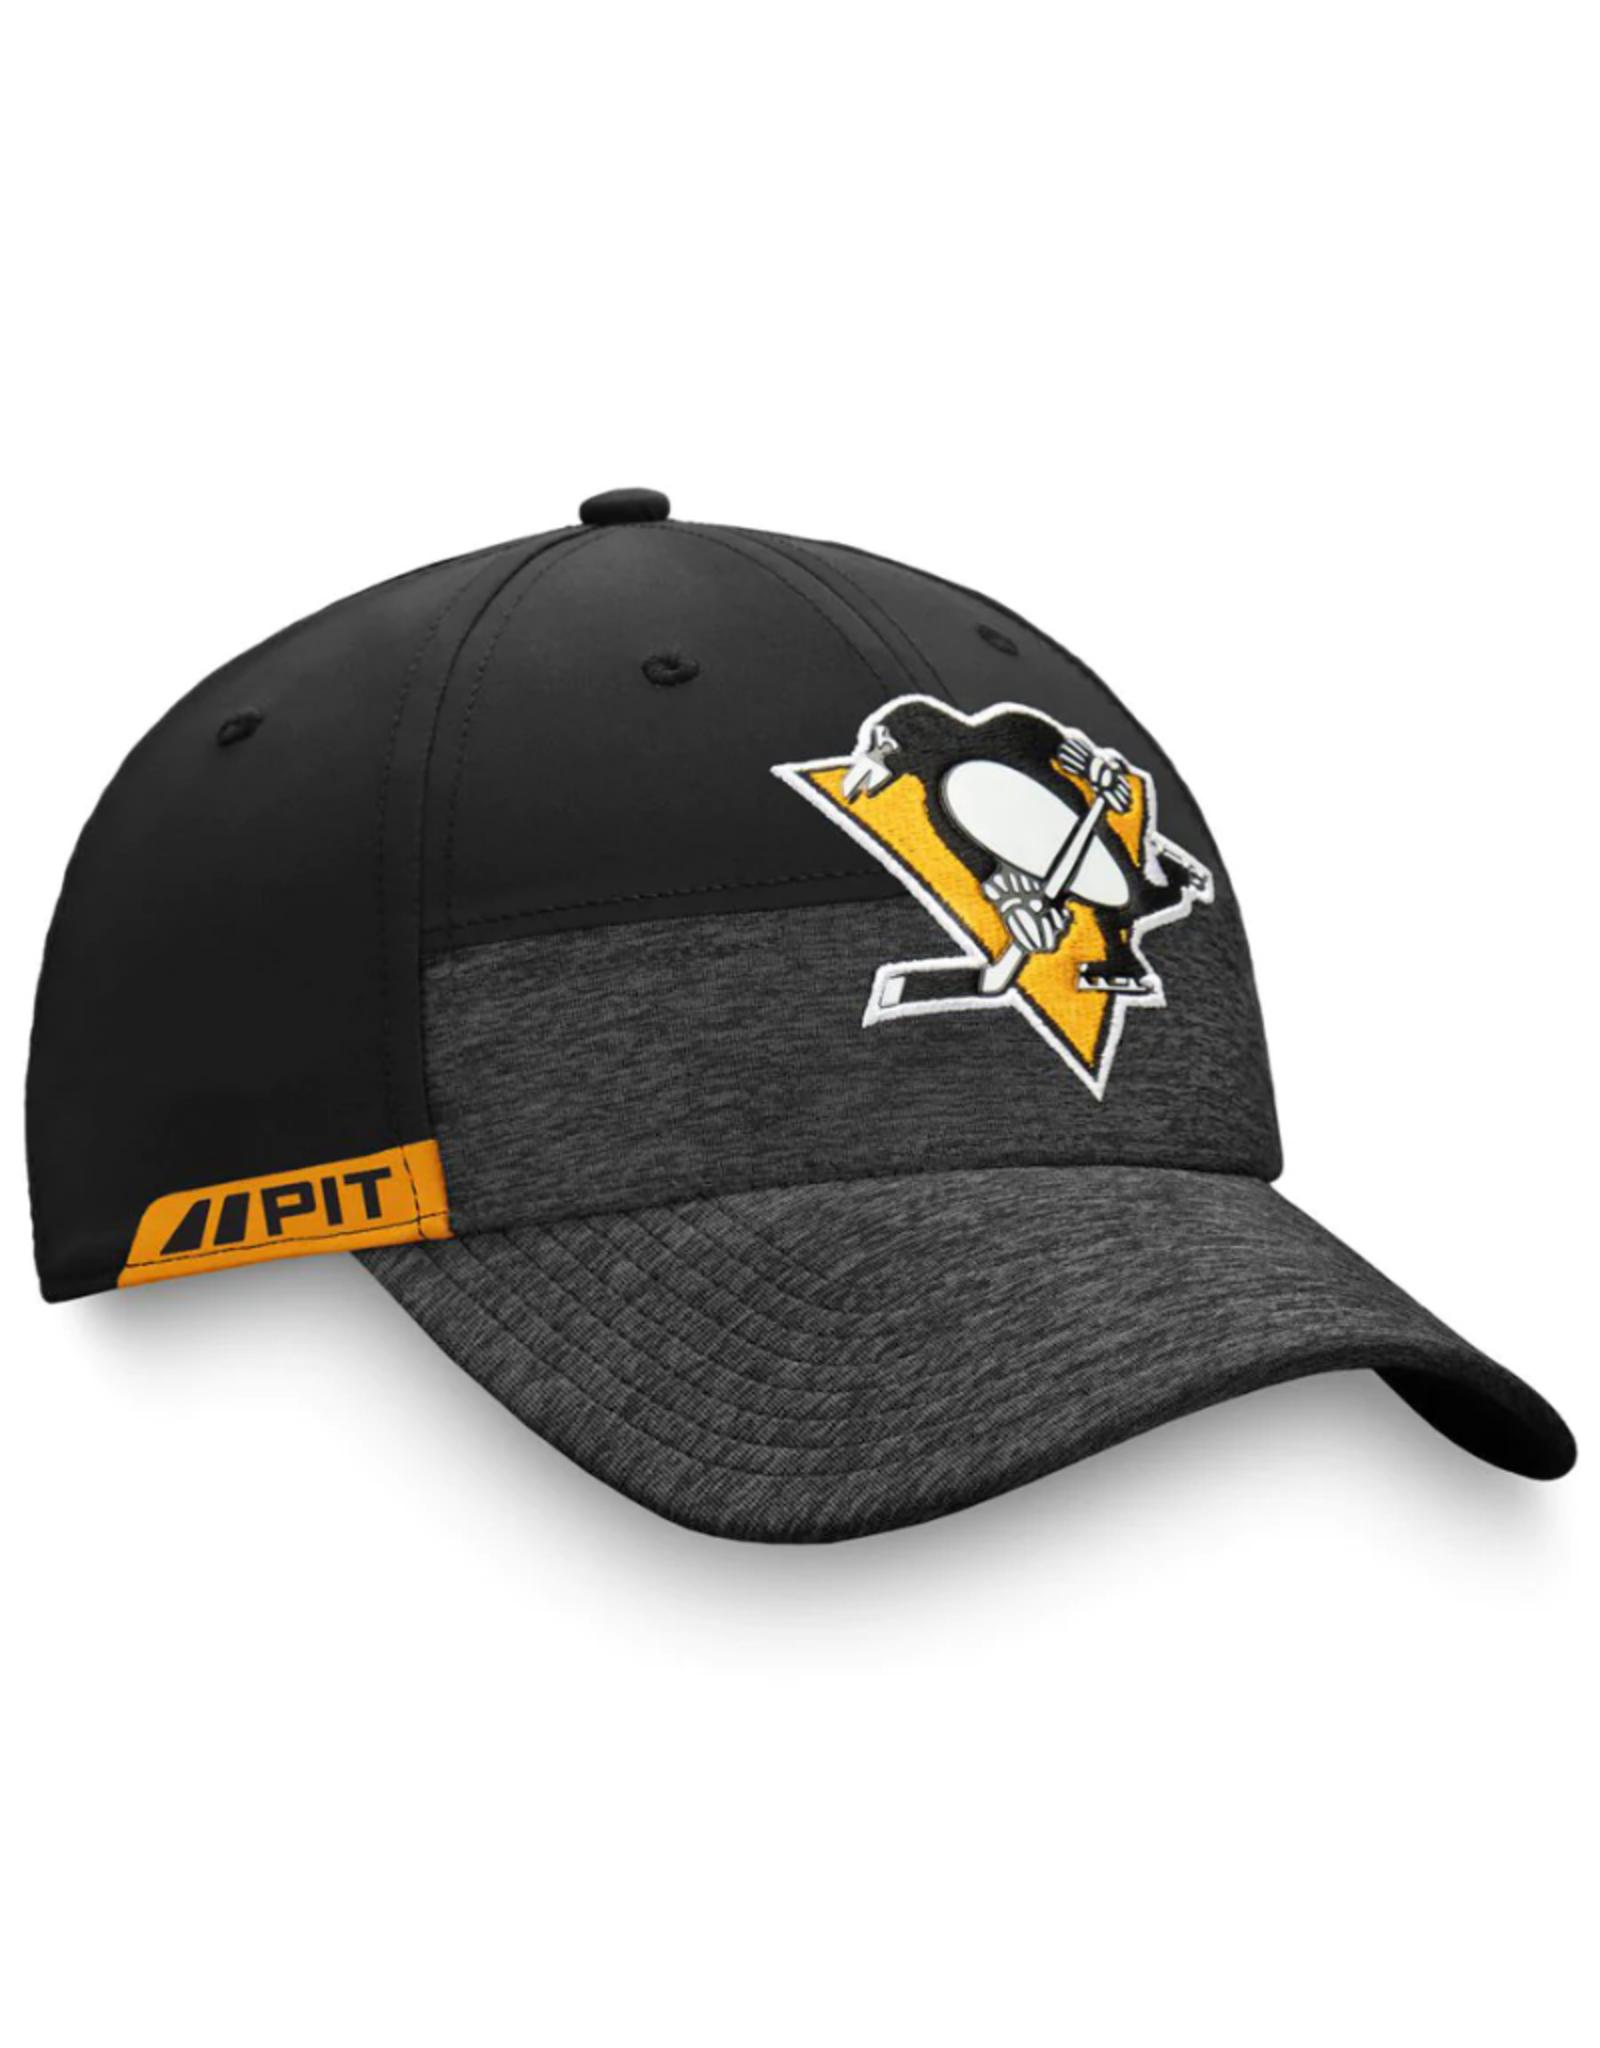 Fanatics Fanatics Men's '20 Locker Room Stretch-Fit Pittsburgh Penguins Black